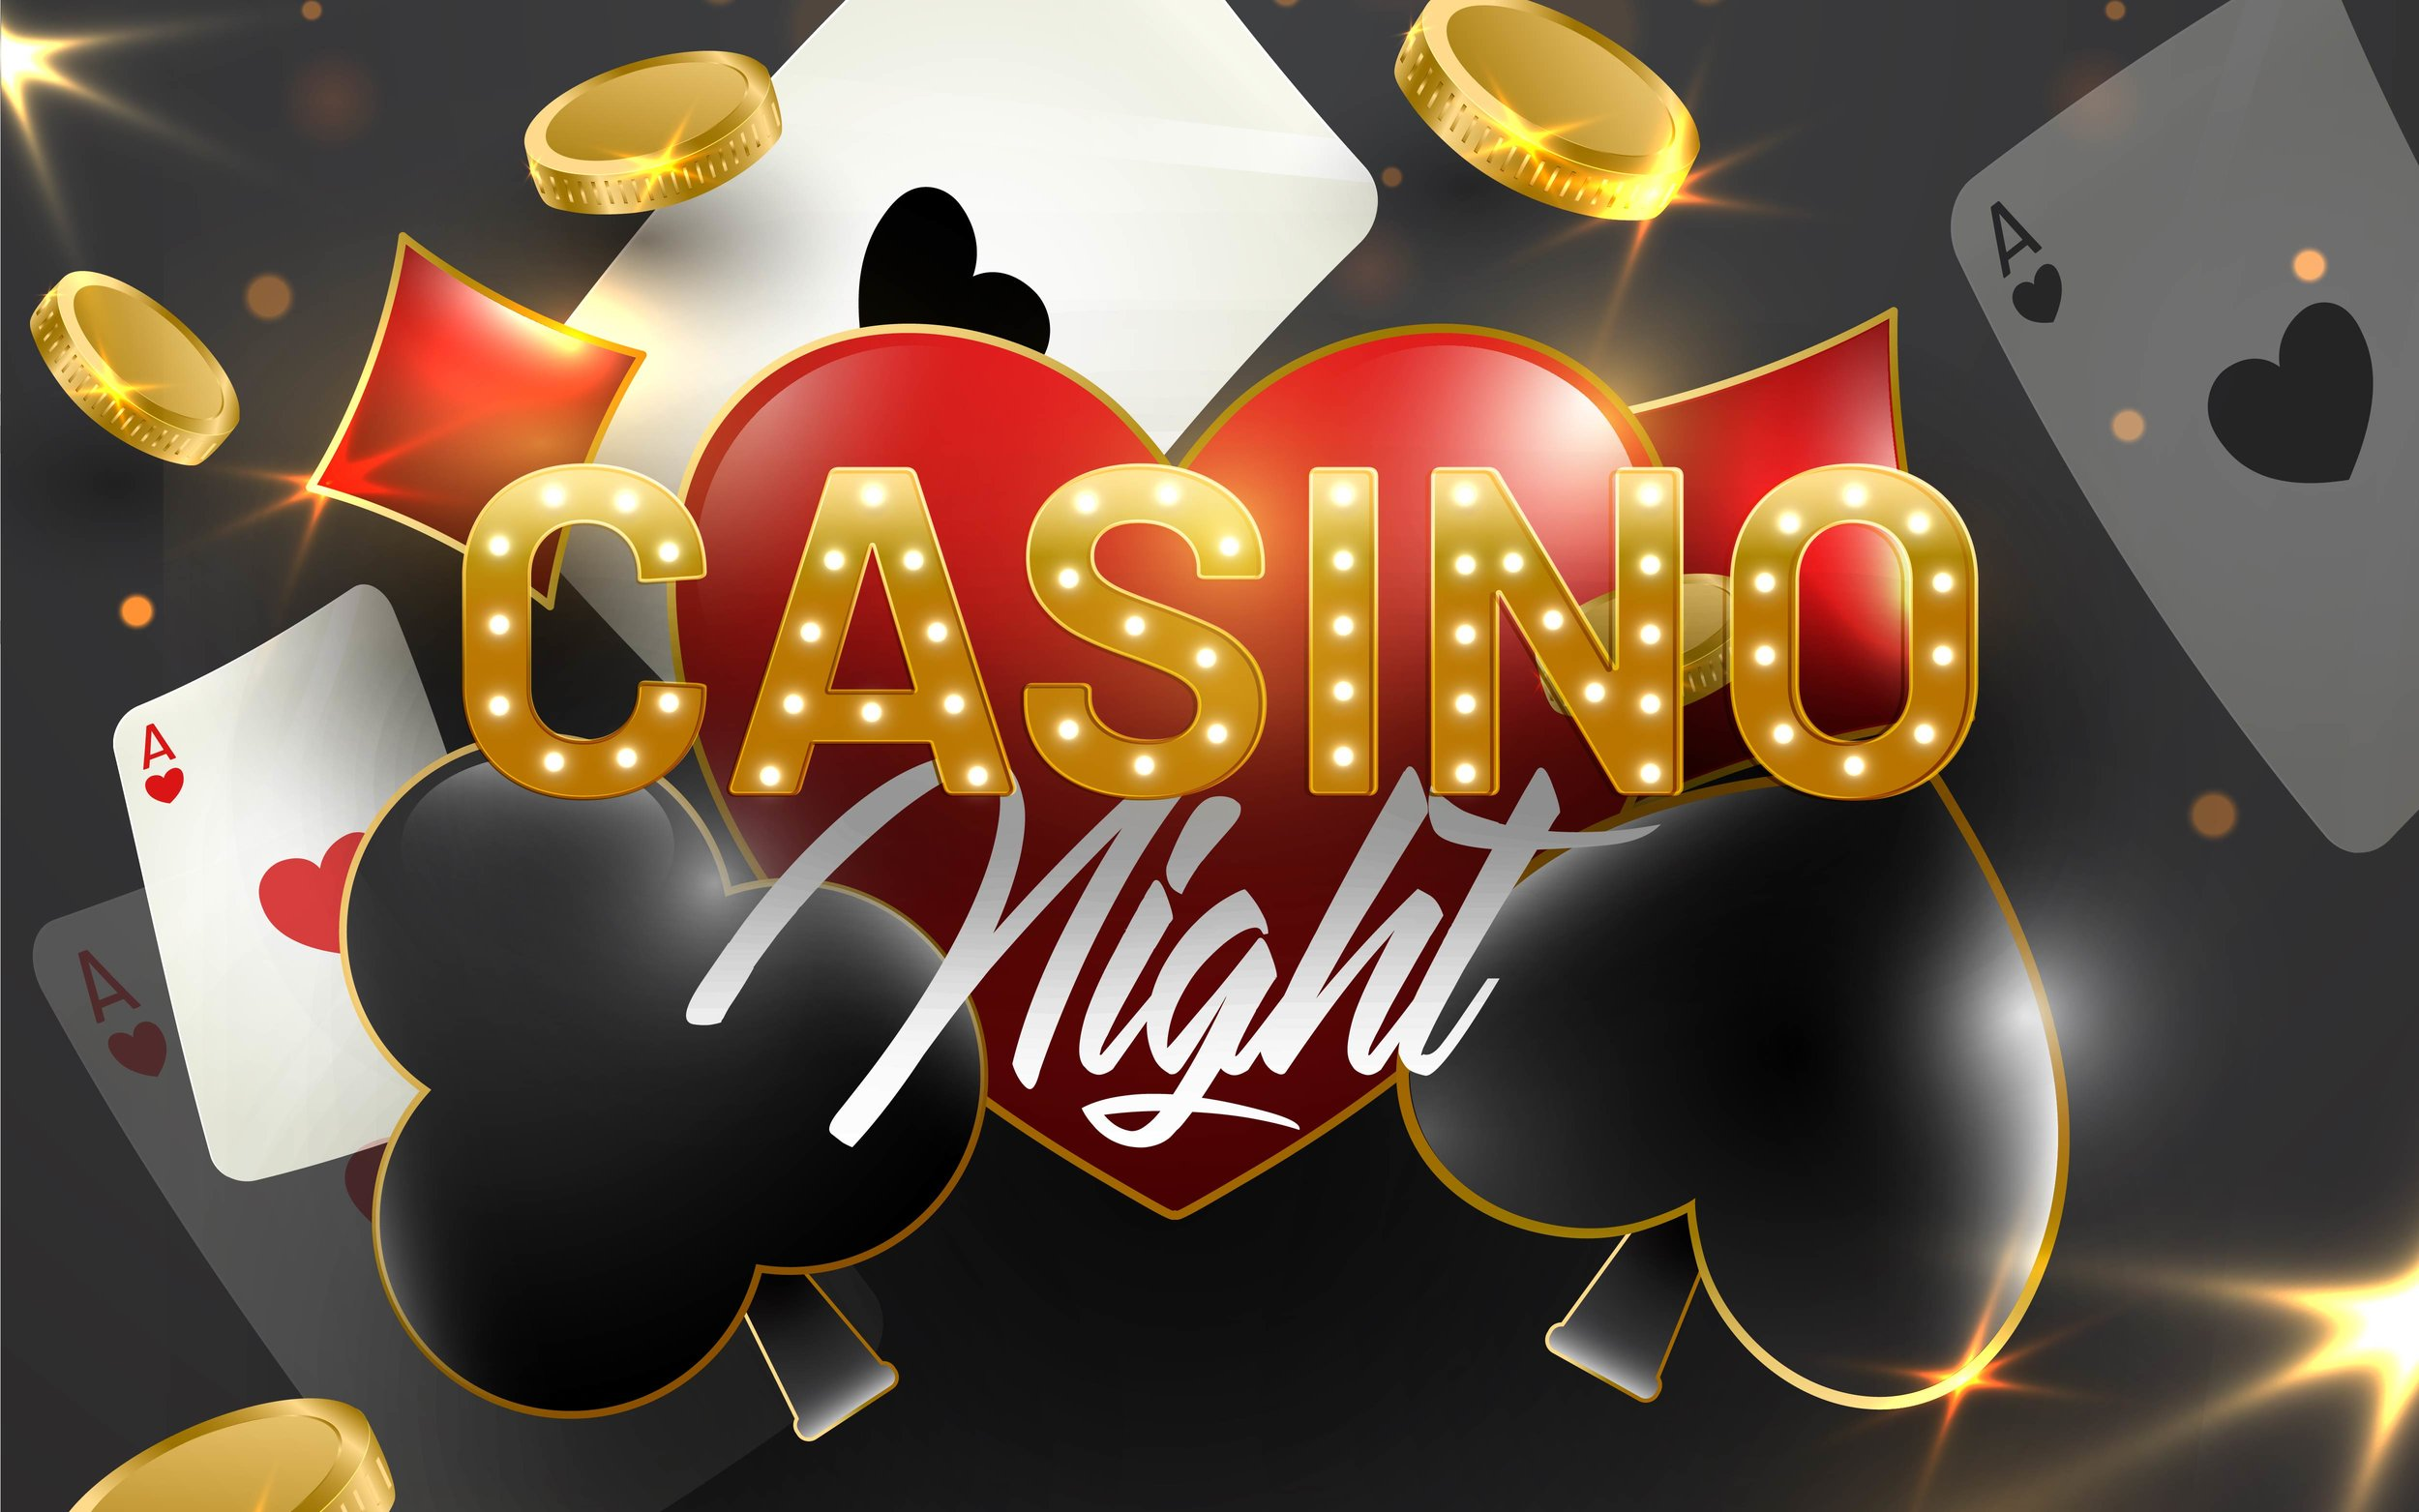 03-19 Casino Night_1200px.jpg